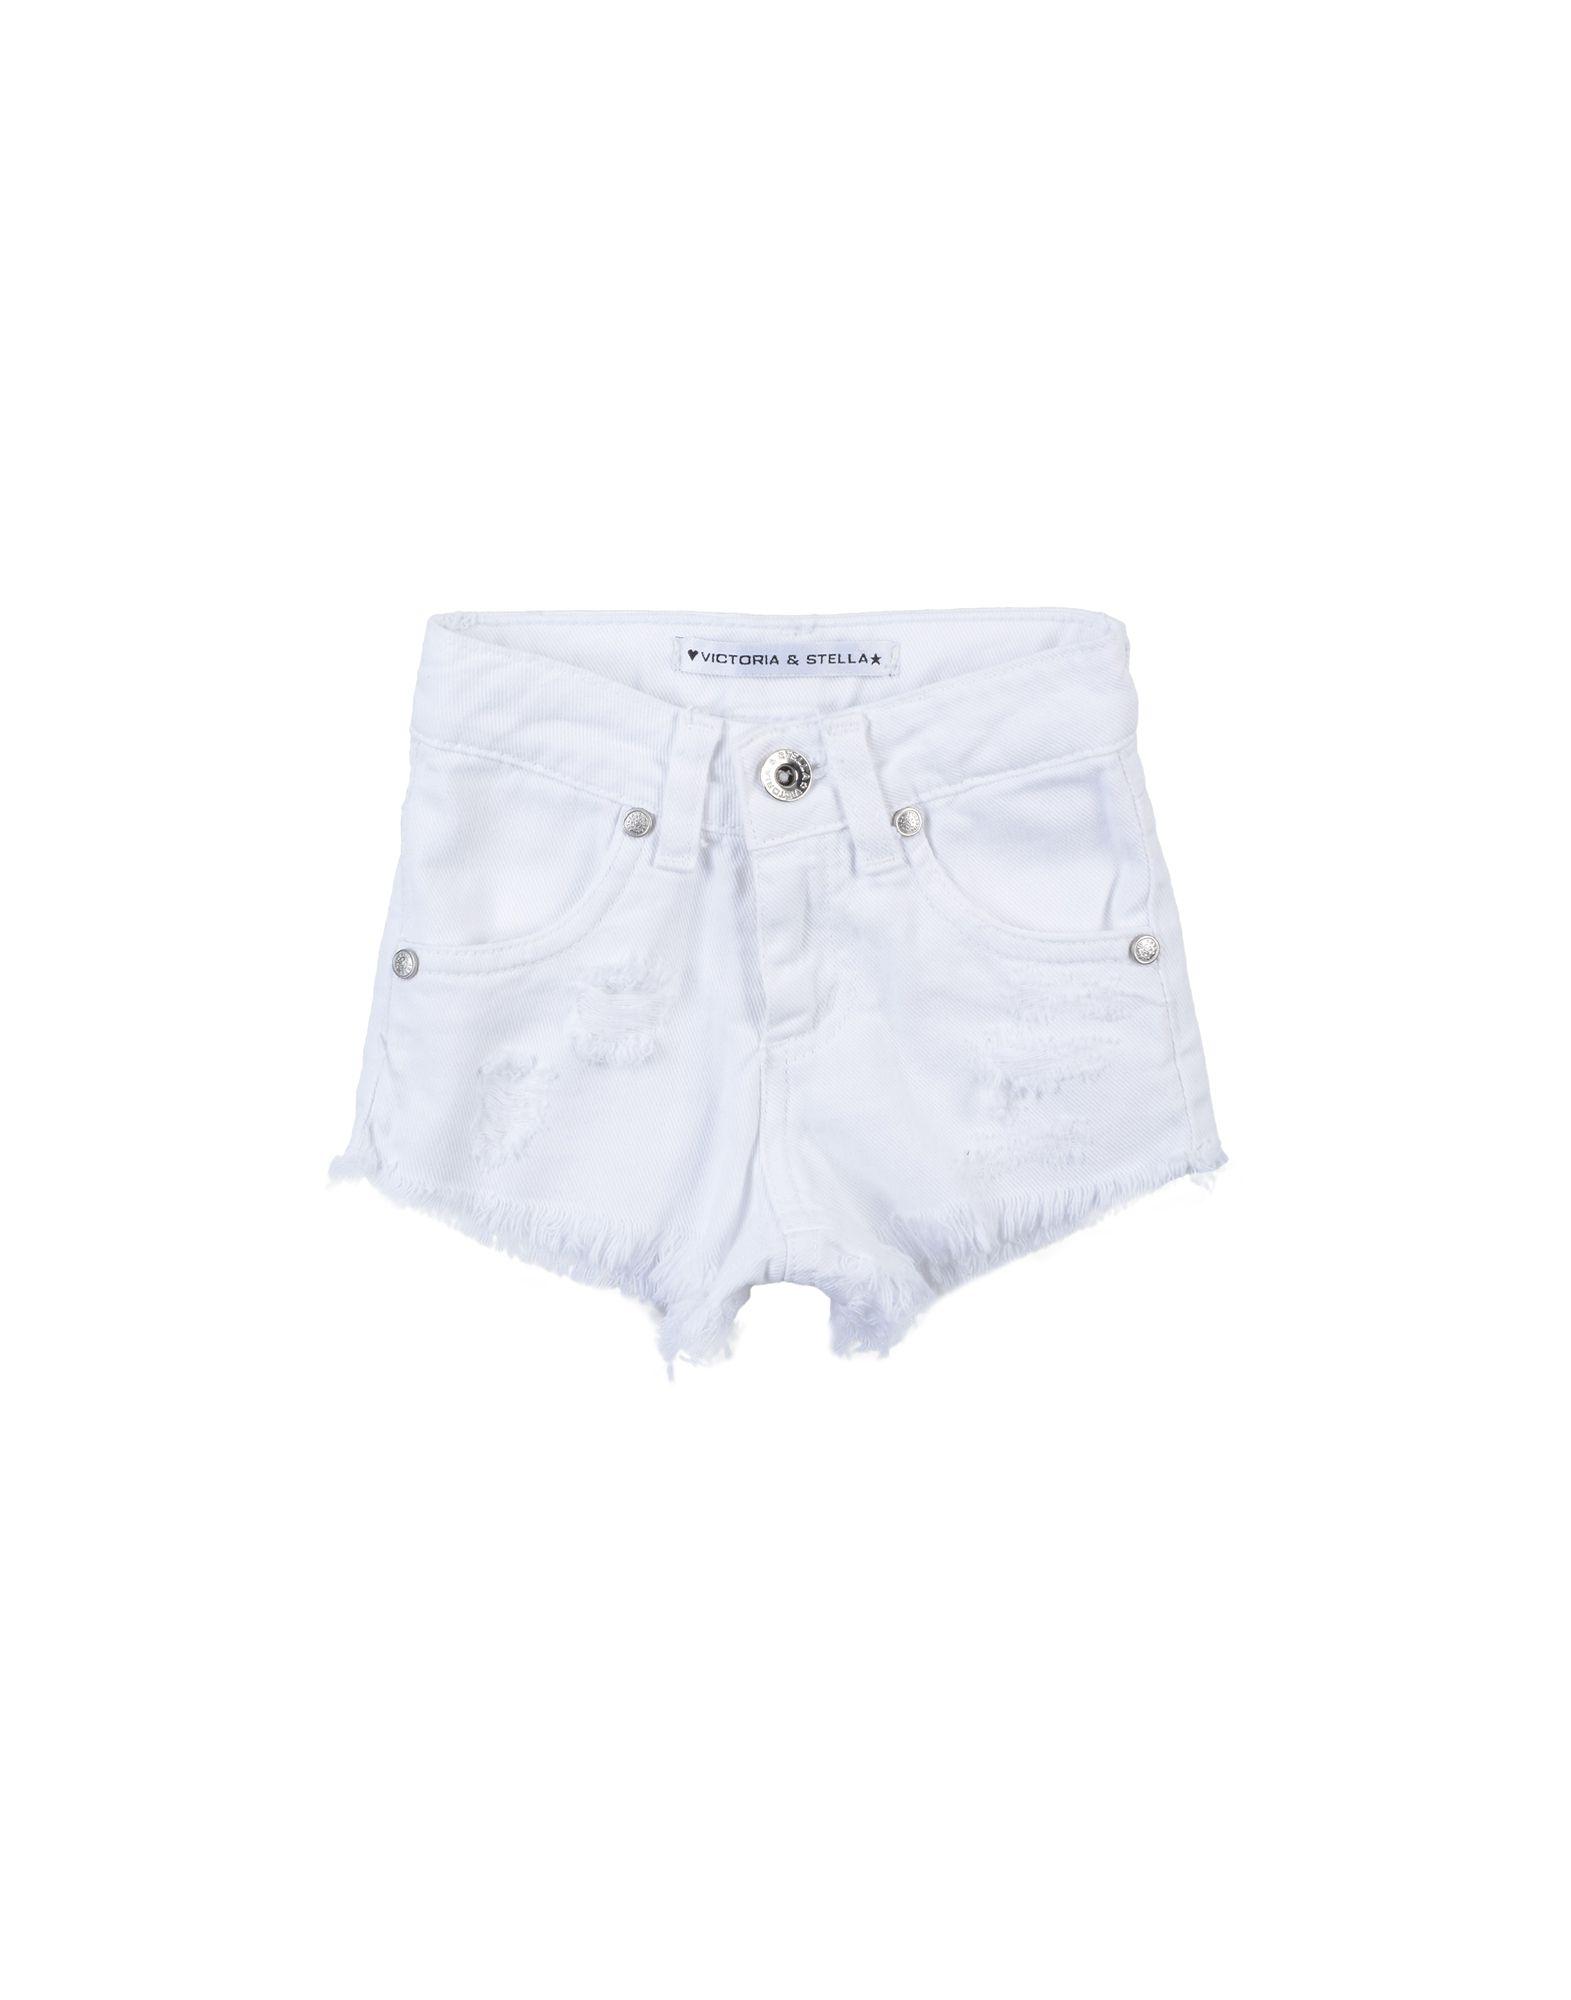 VICTORIA & STELLA Denim shorts - Item 42696839